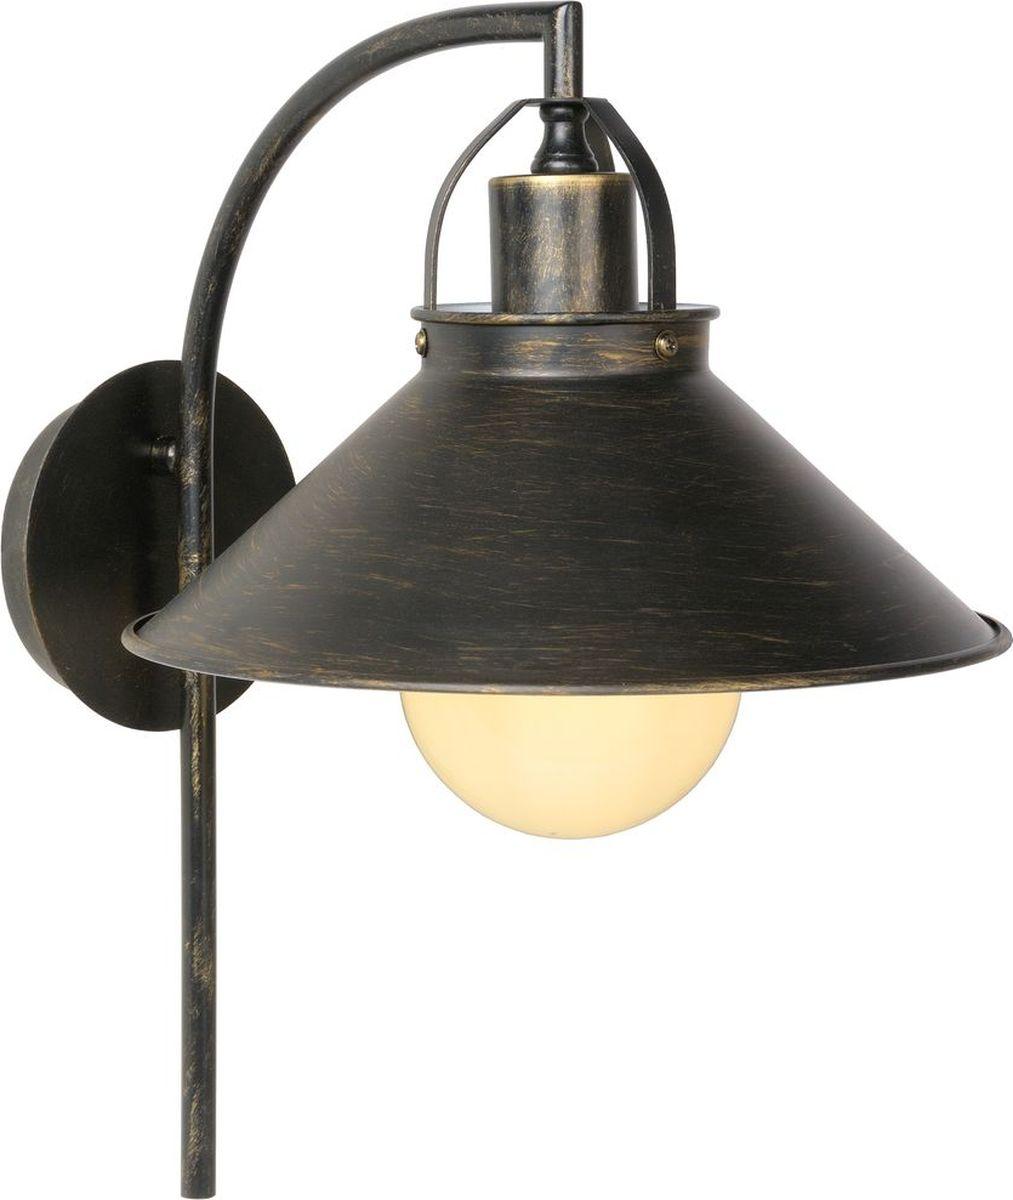 Бра Lucide Berkley, цвет: коричневый, E27, 40 Вт. 31220/01/9731220/01/97